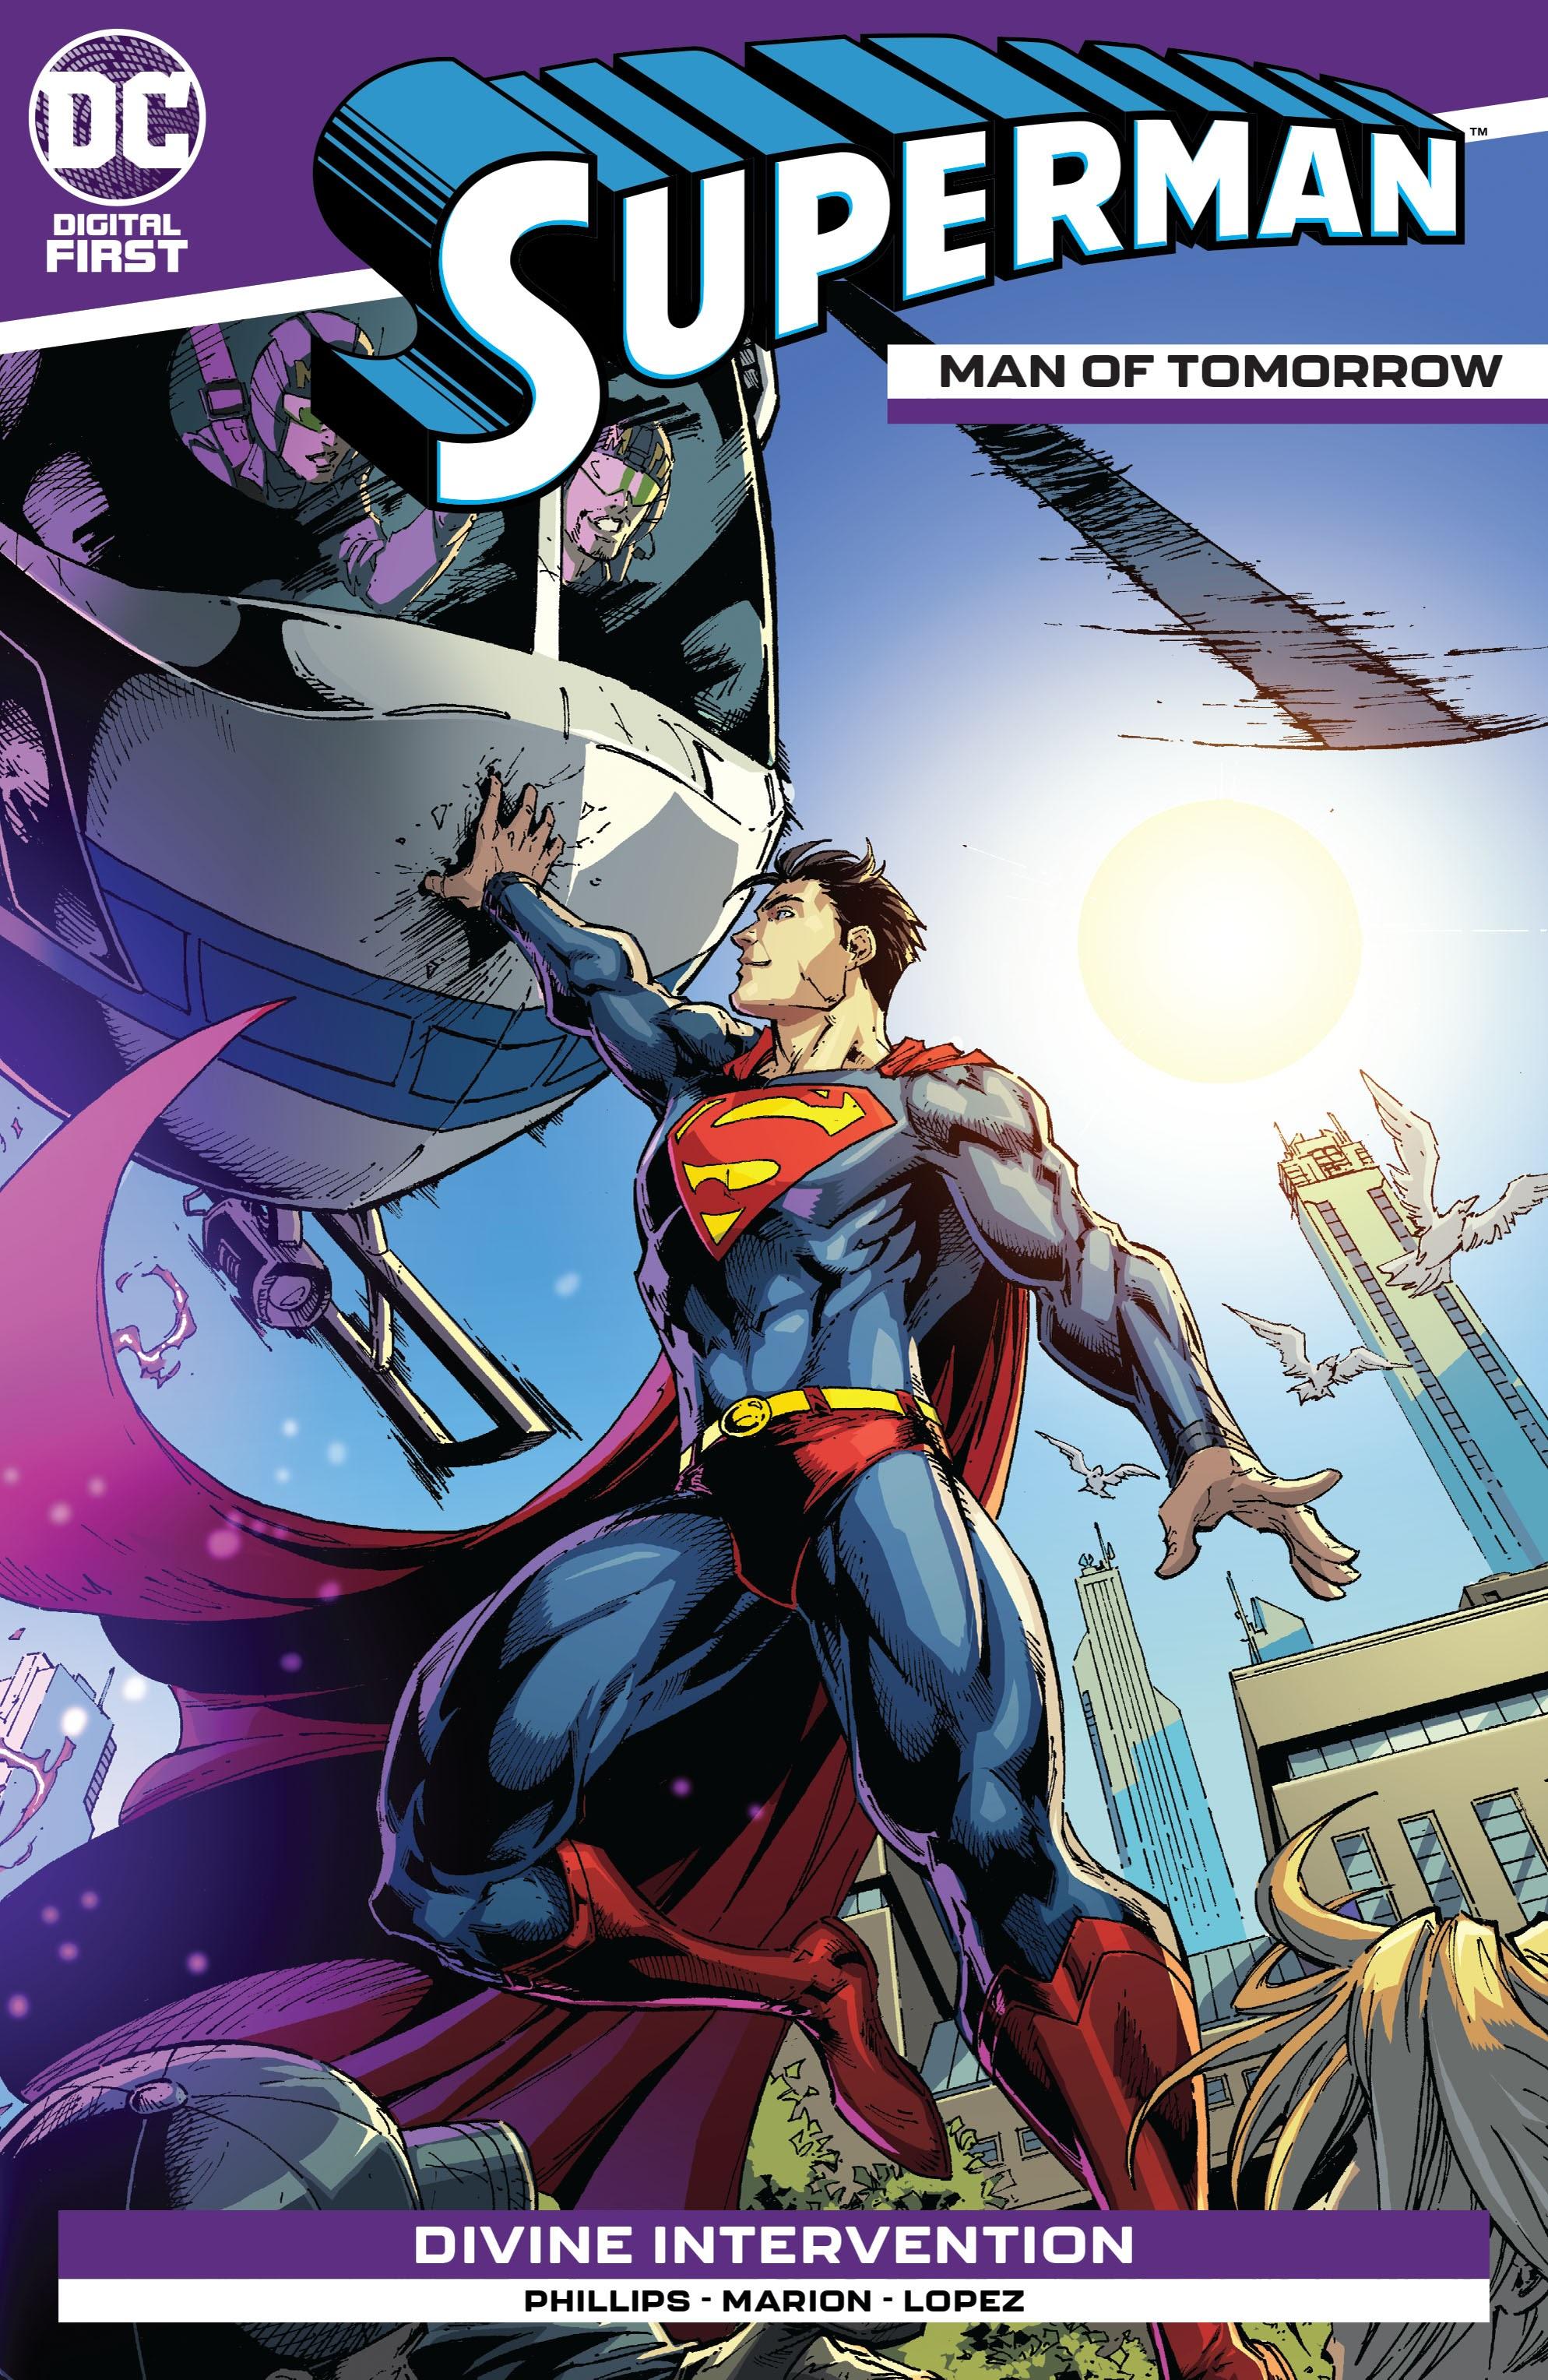 Superman: Man of Tomorrow Vol 1 17 (Digital)